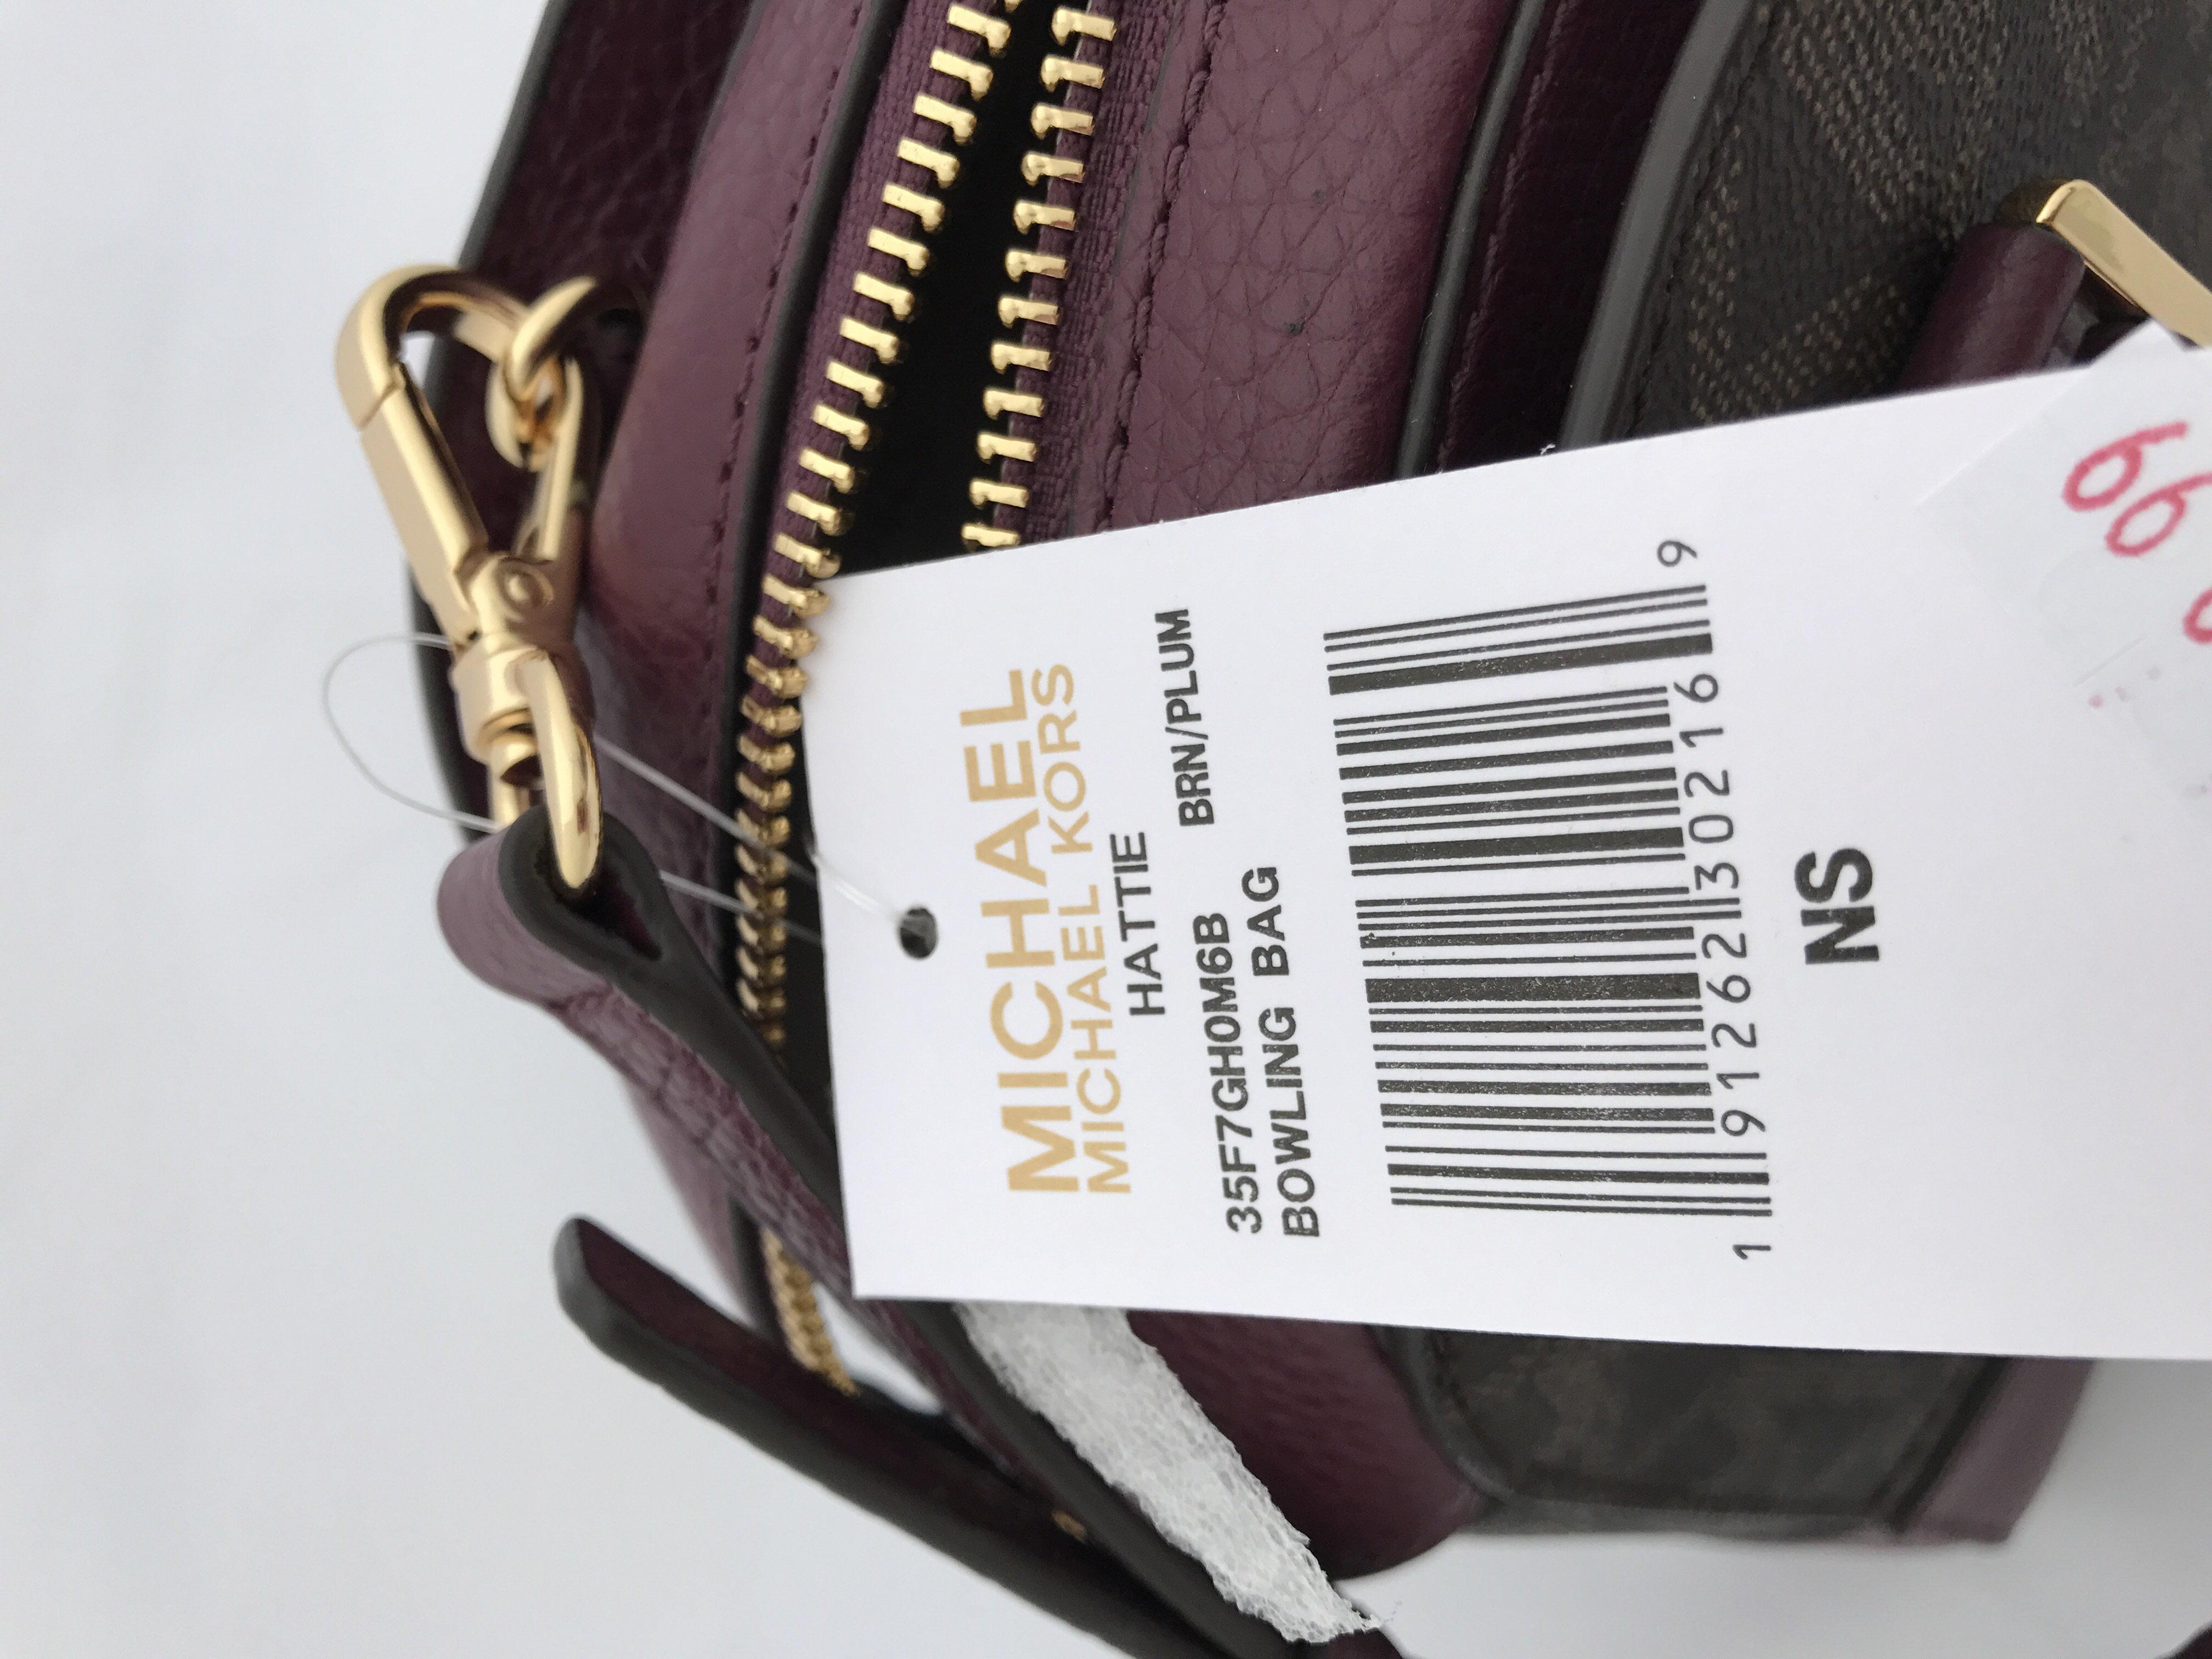 08b946b9e474fb Michael Kors - Michael Kors Hattie MK Signature Bowling Satchel Bag Brown  Plum Crossbody - Walmart.com